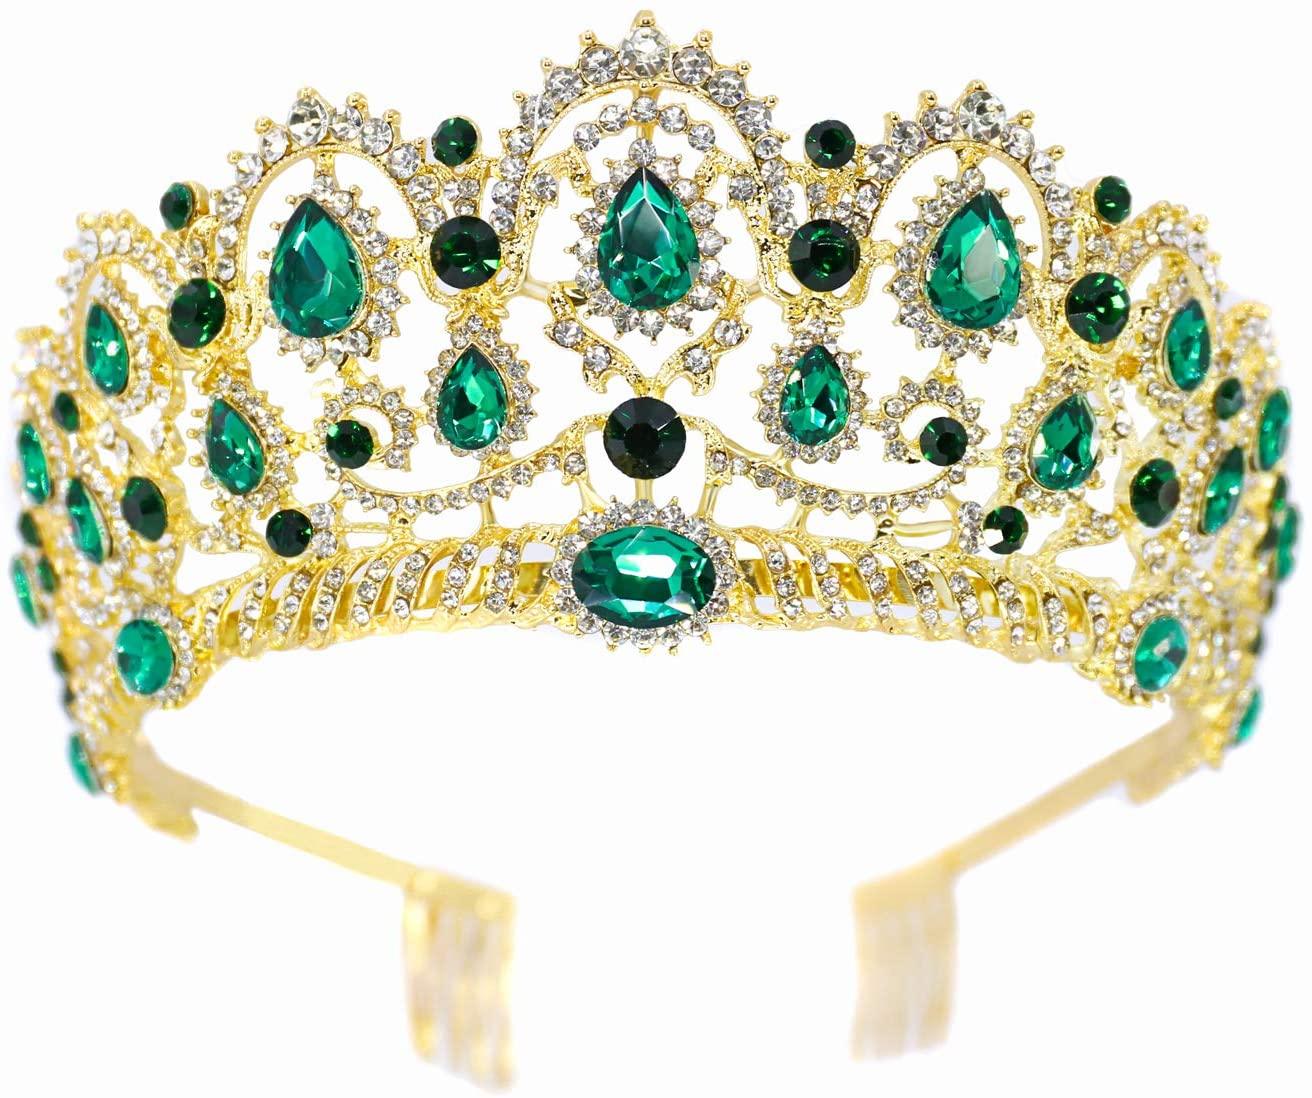 Green Crown Rhinestone Tiara with Comb, Clear Austrian Crystal Bridal Party Headband, Unique Wedding Accessories